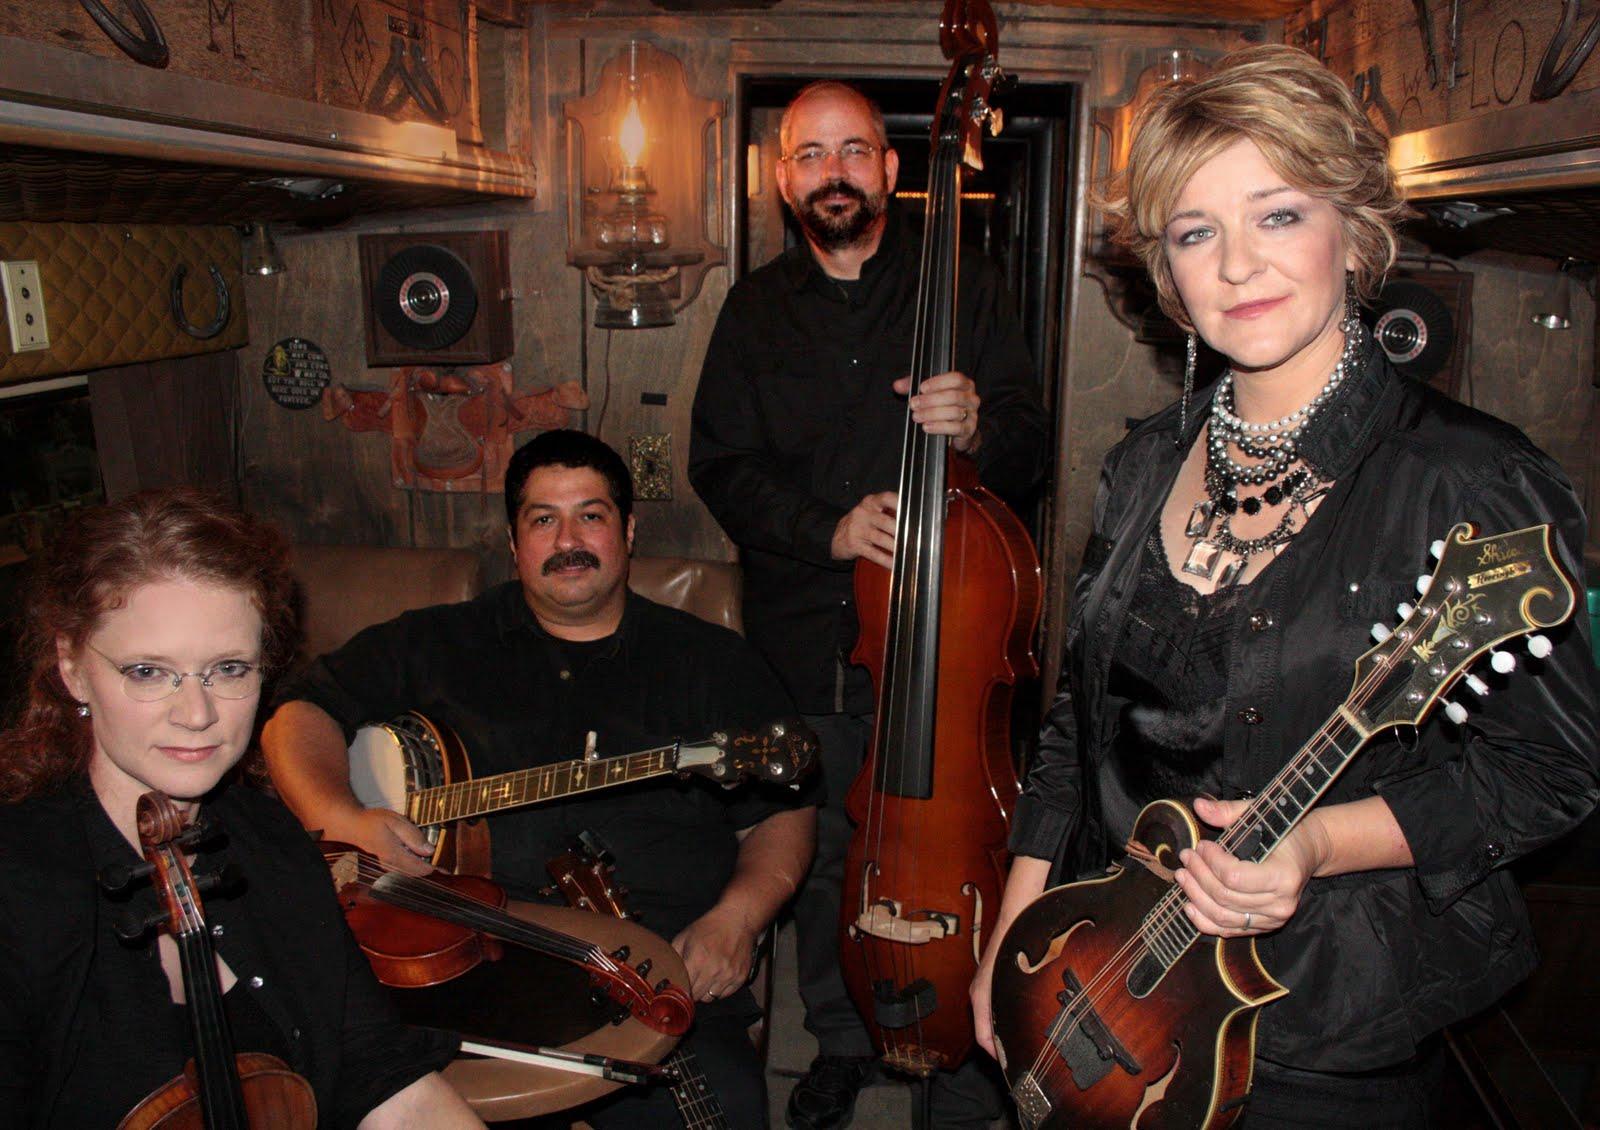 Valerie Smith Dan Kecintaannya Pada Musik Bluegrass